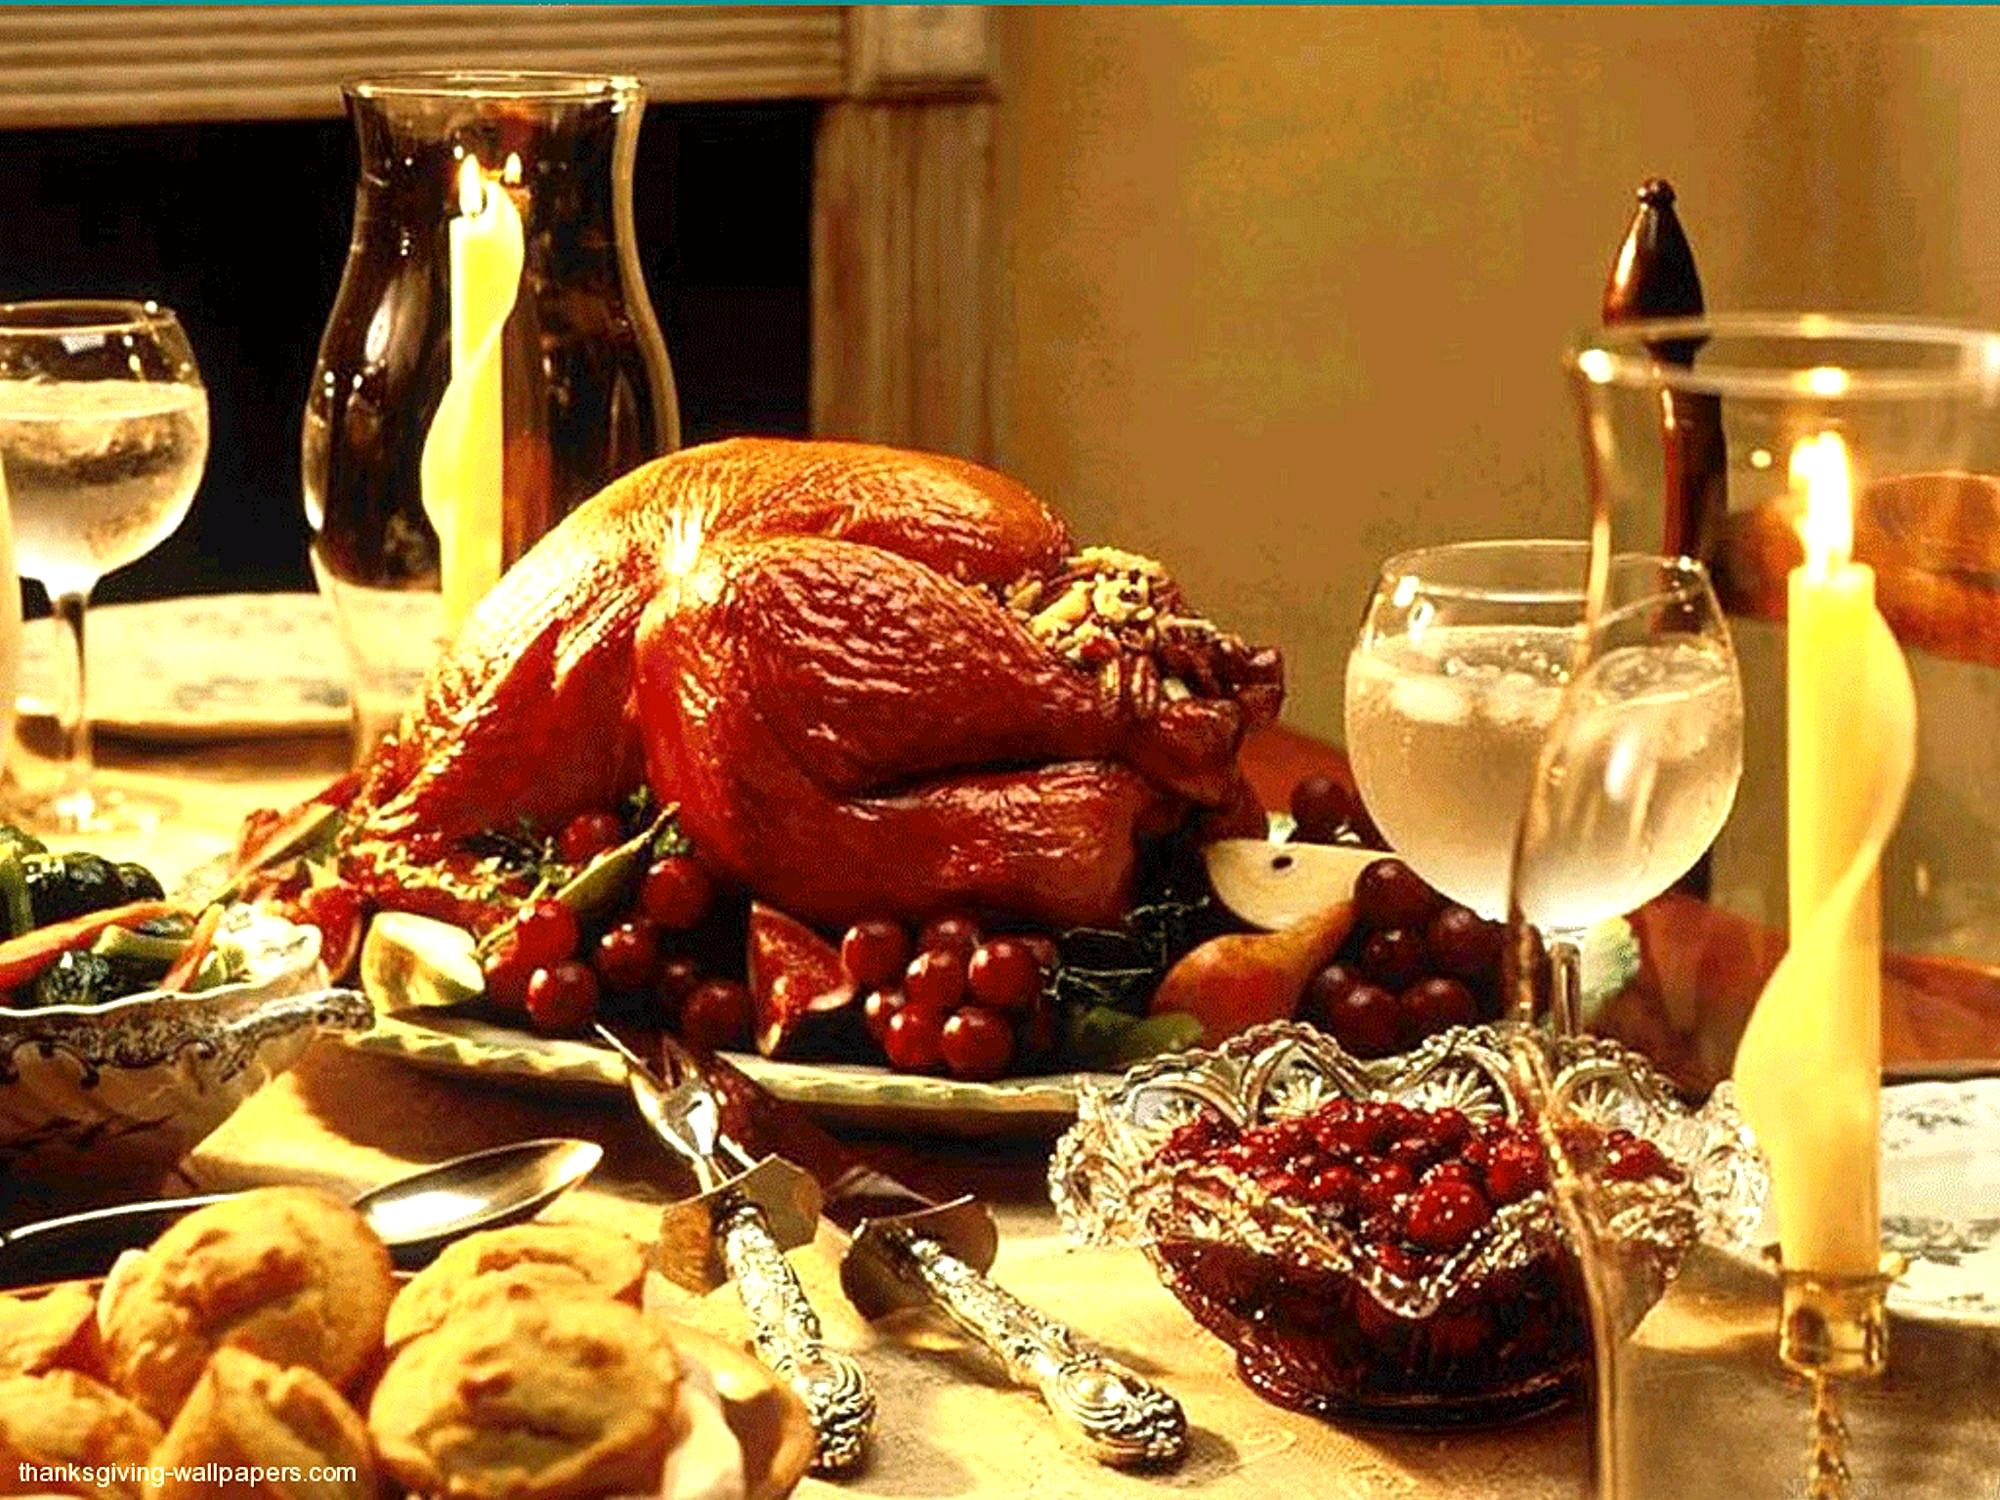 Thanksgiving Dinner Decorating Ideas Stunning Thanksgiving Dinner - Turkey decorating ideas